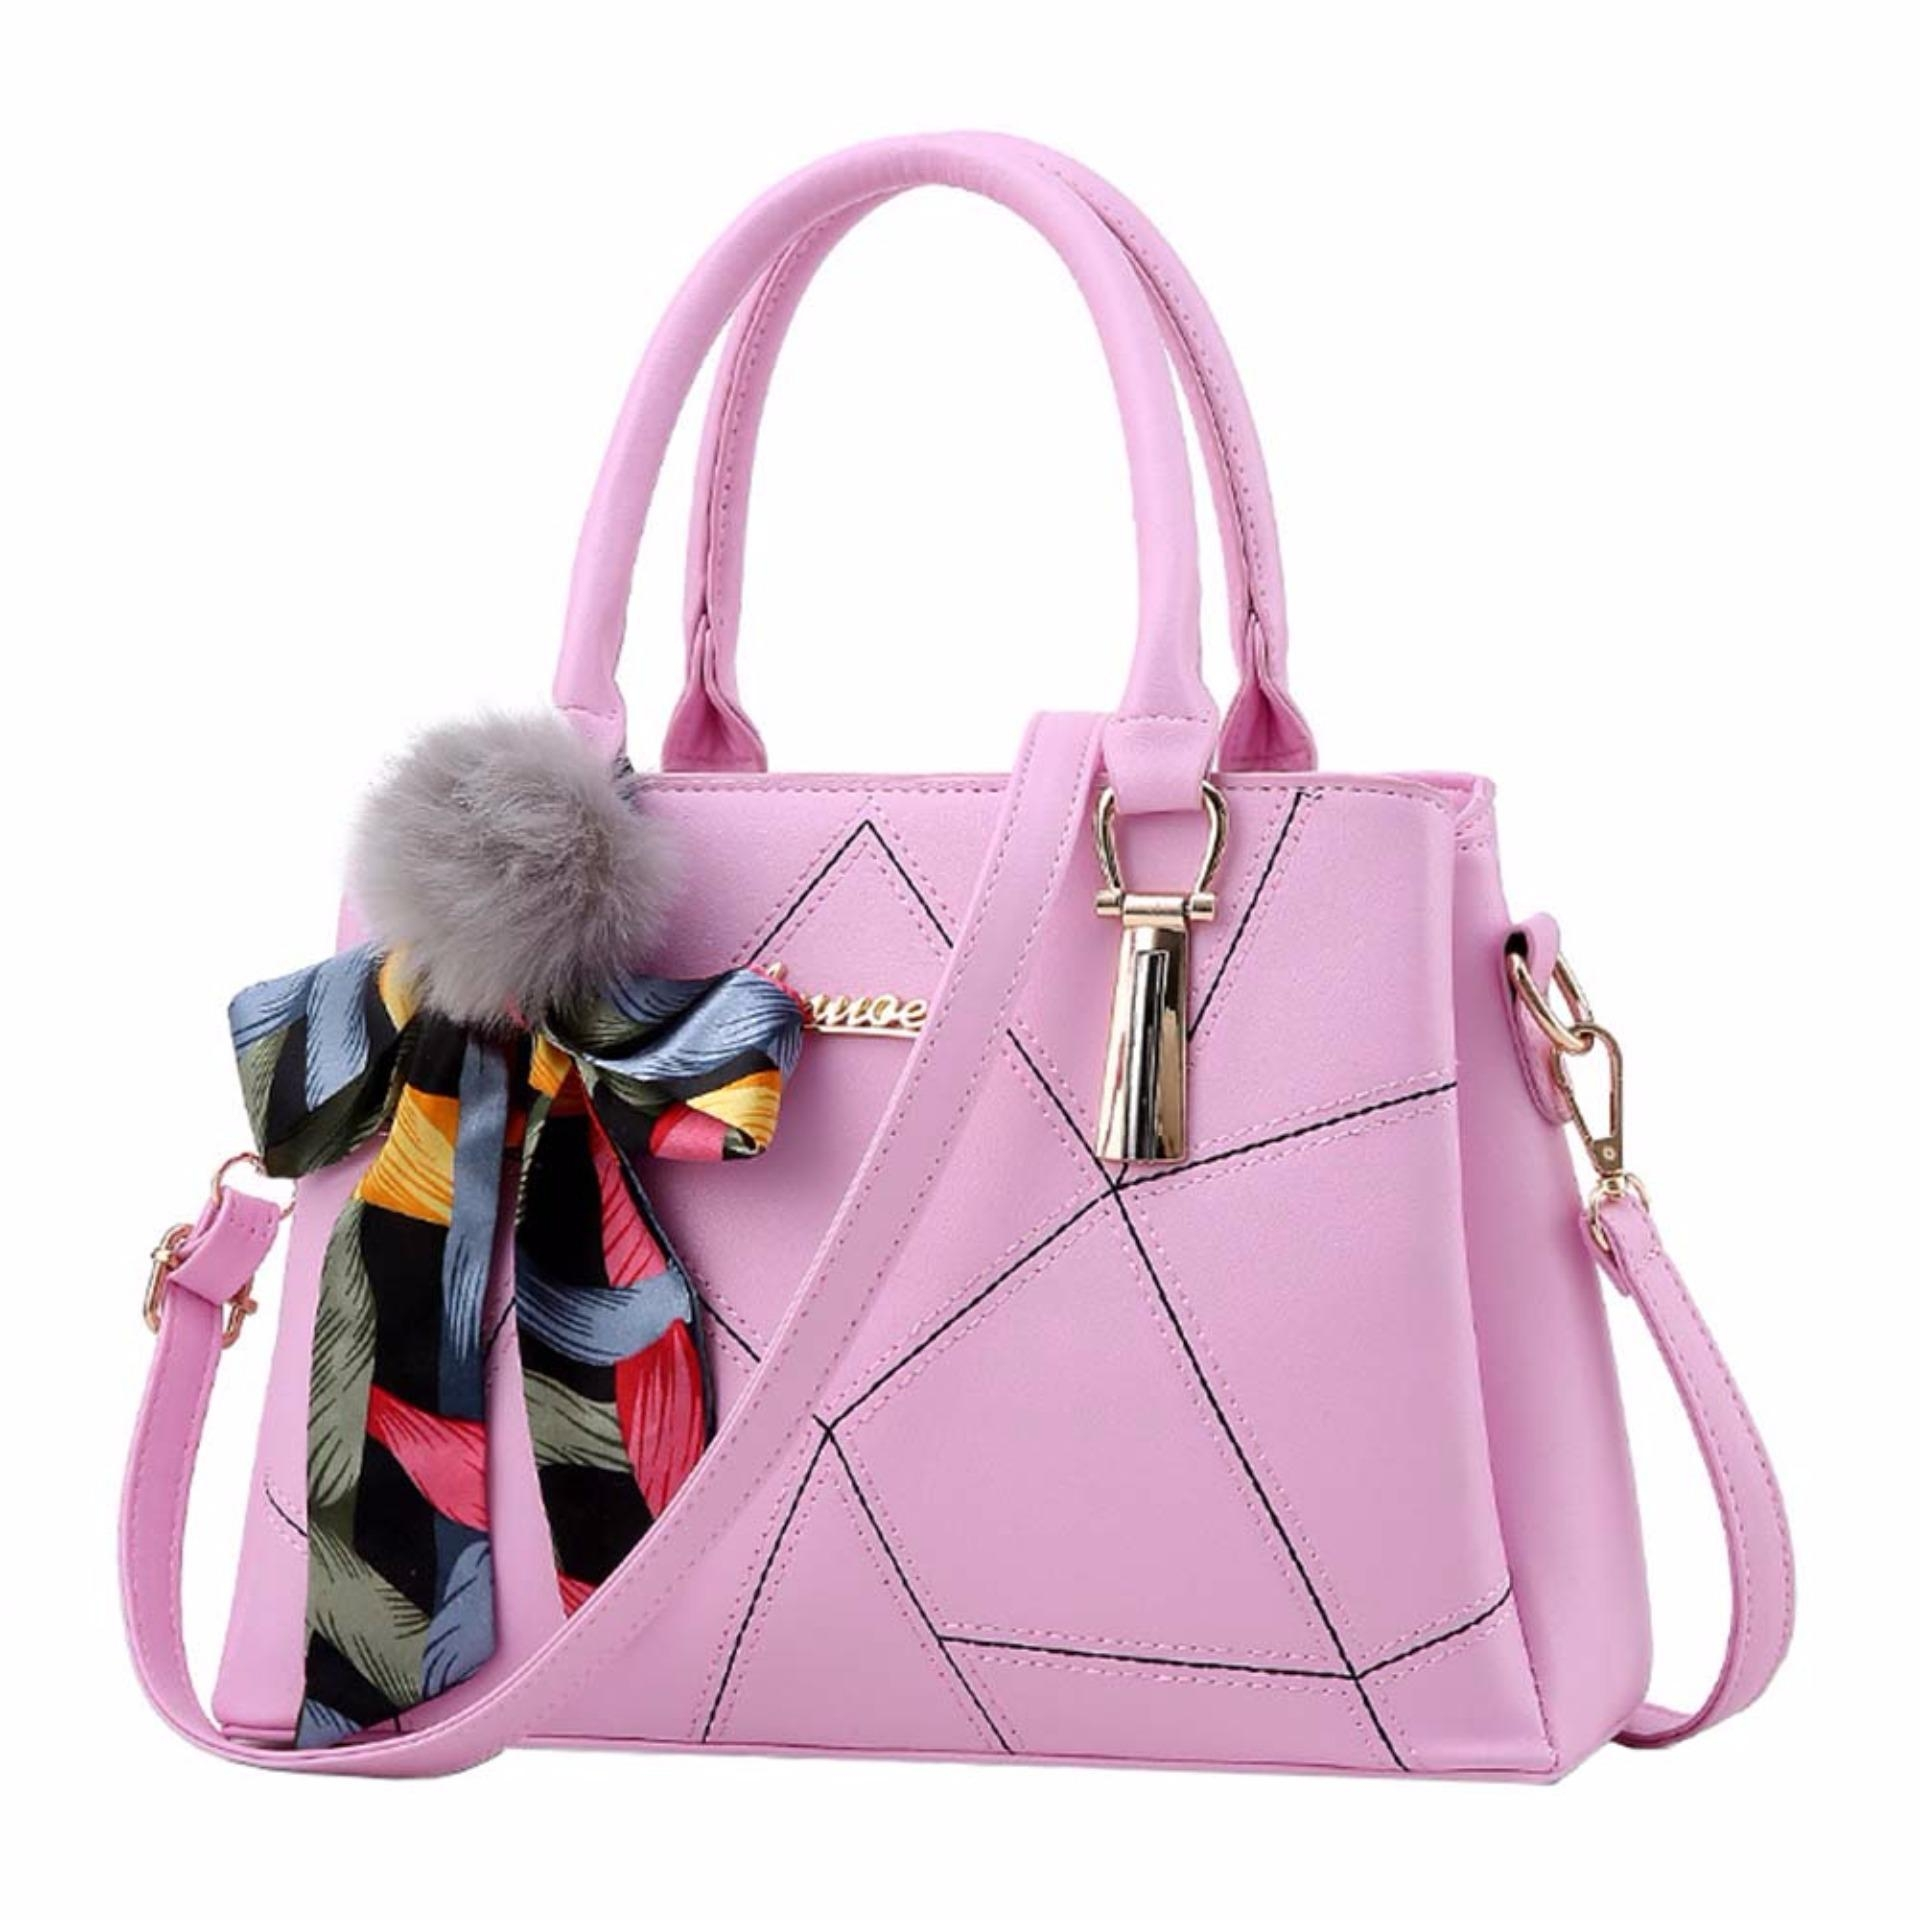 e71725d5cd Eleganya Korean Lady Women Hobo PU Leather Messenger Handbag Shoulder Bag  Purse H07. image. image. image. image. image